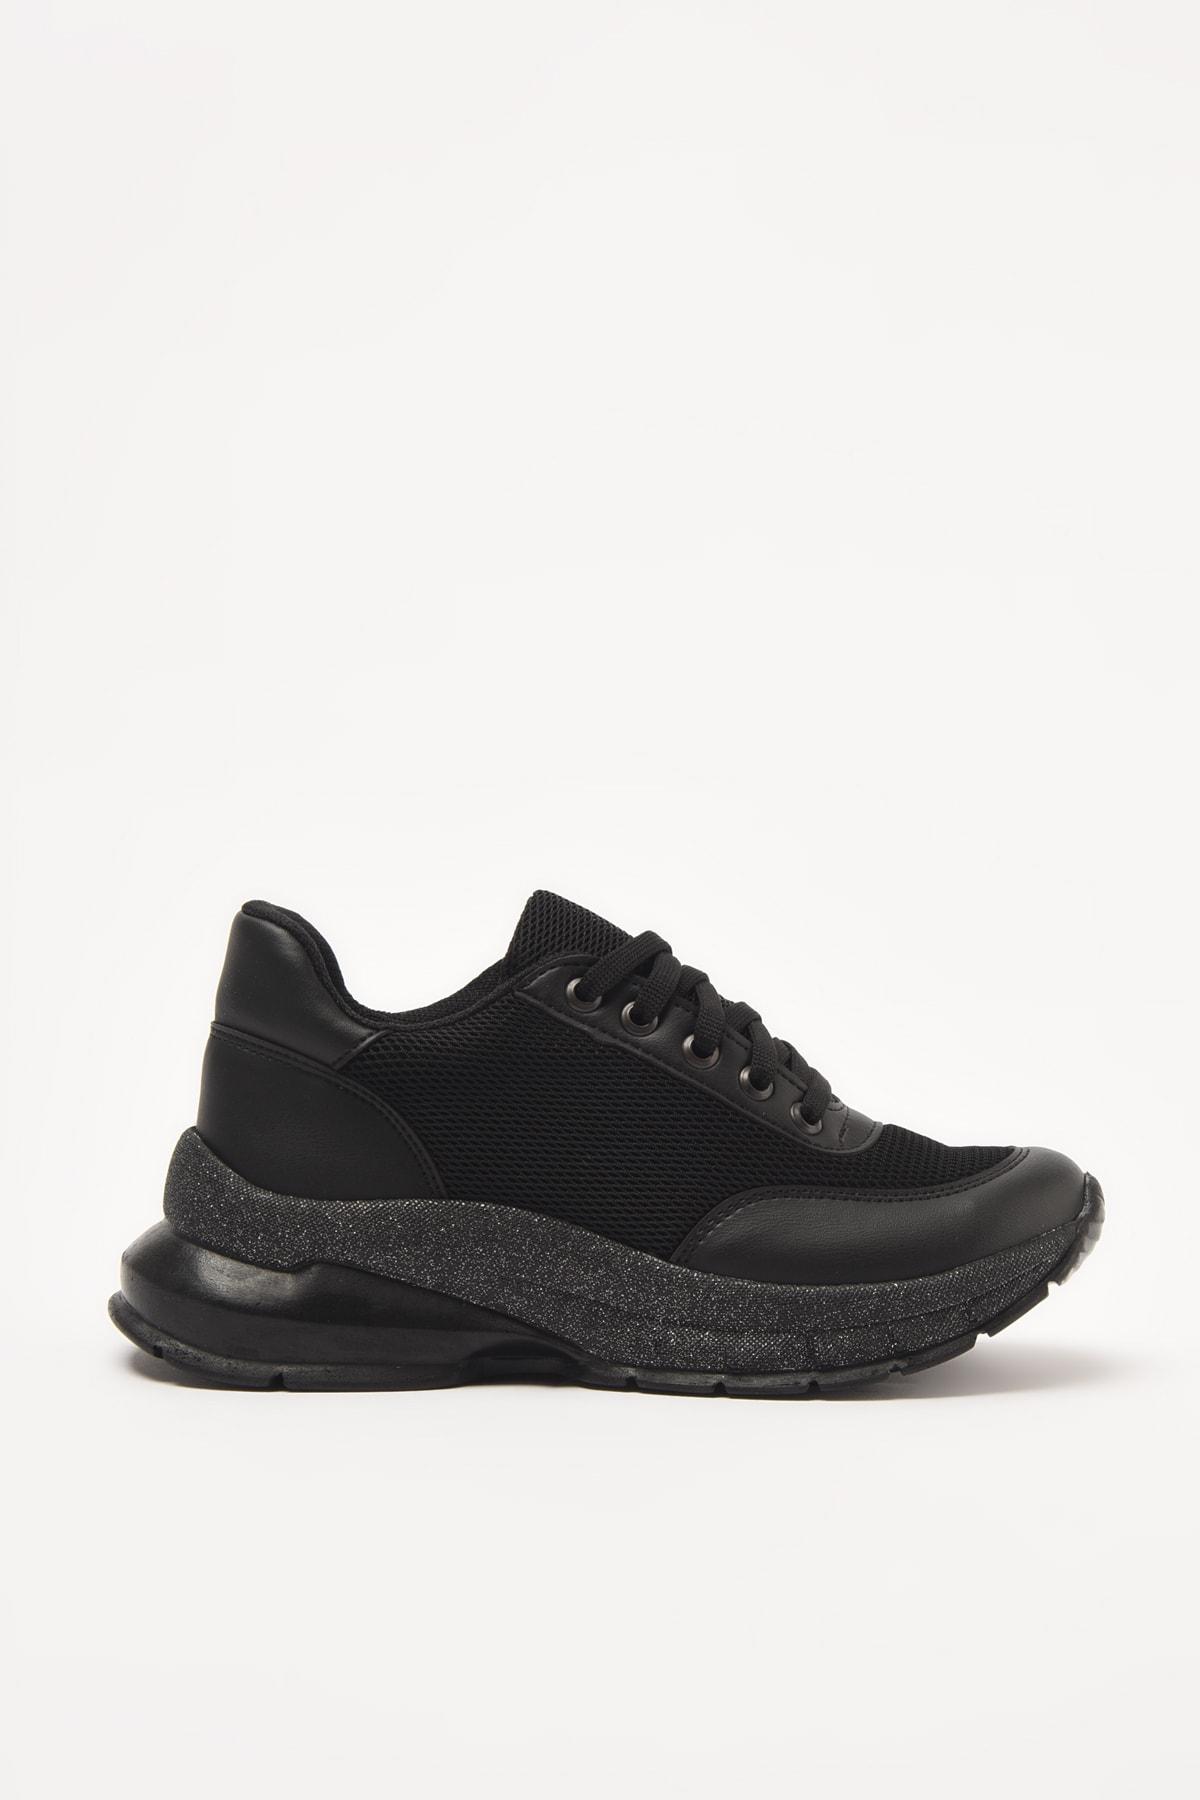 Yaya  by Hotiç Siyah Kadın Sneaker 01AYY209250A100 2